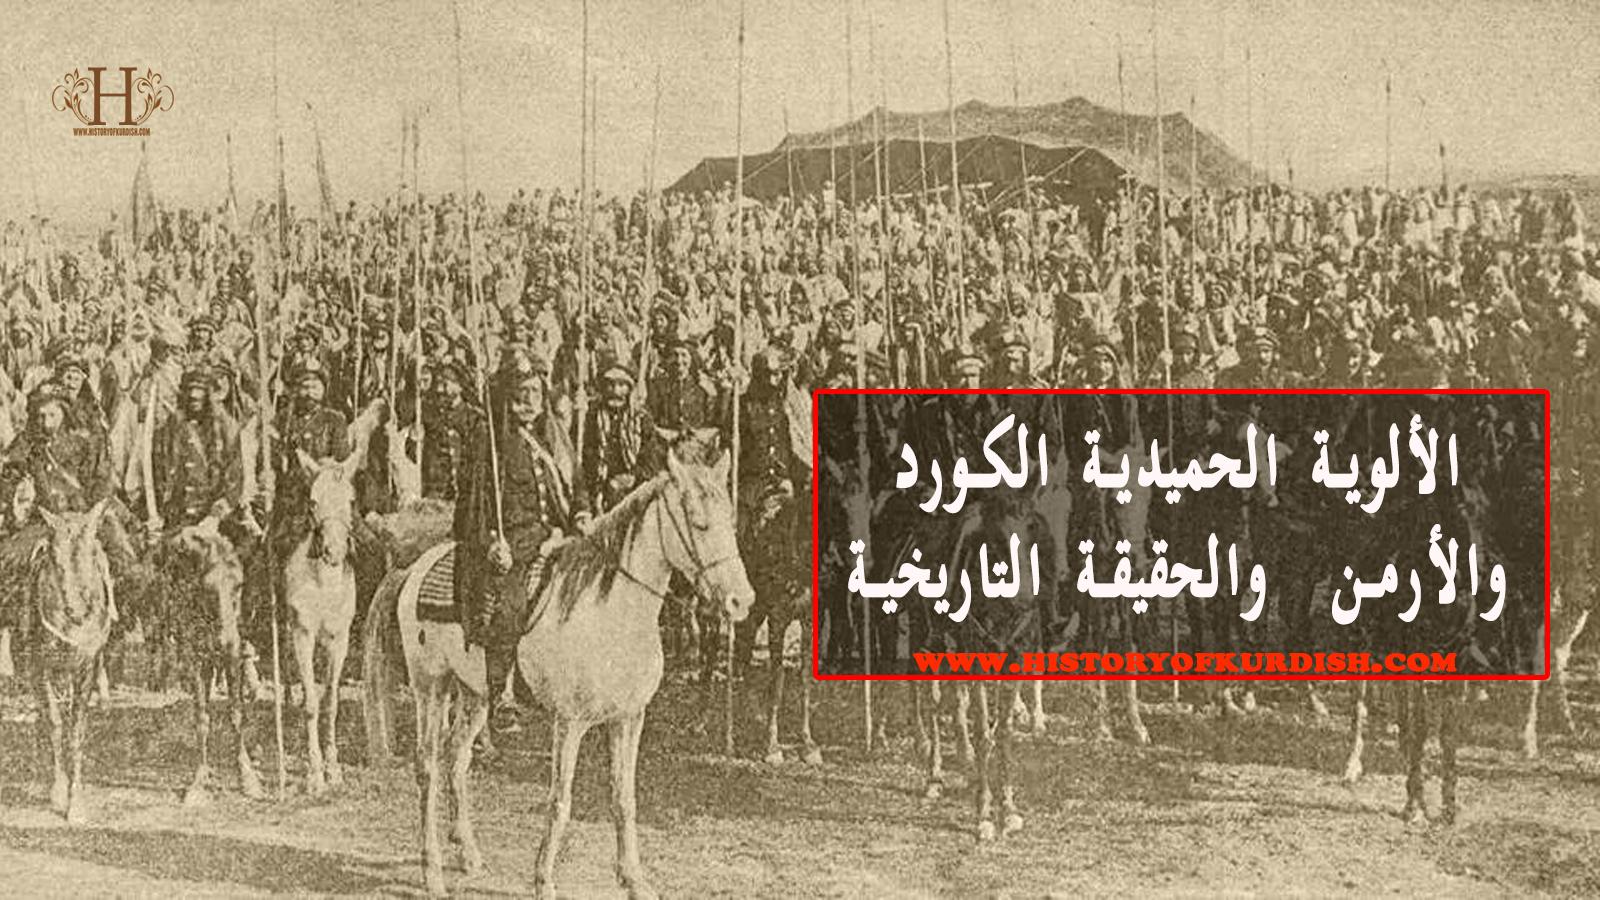 Photo of الألوية الحميدية ''الكورد والأرمن '' والحقيقة التاريخية